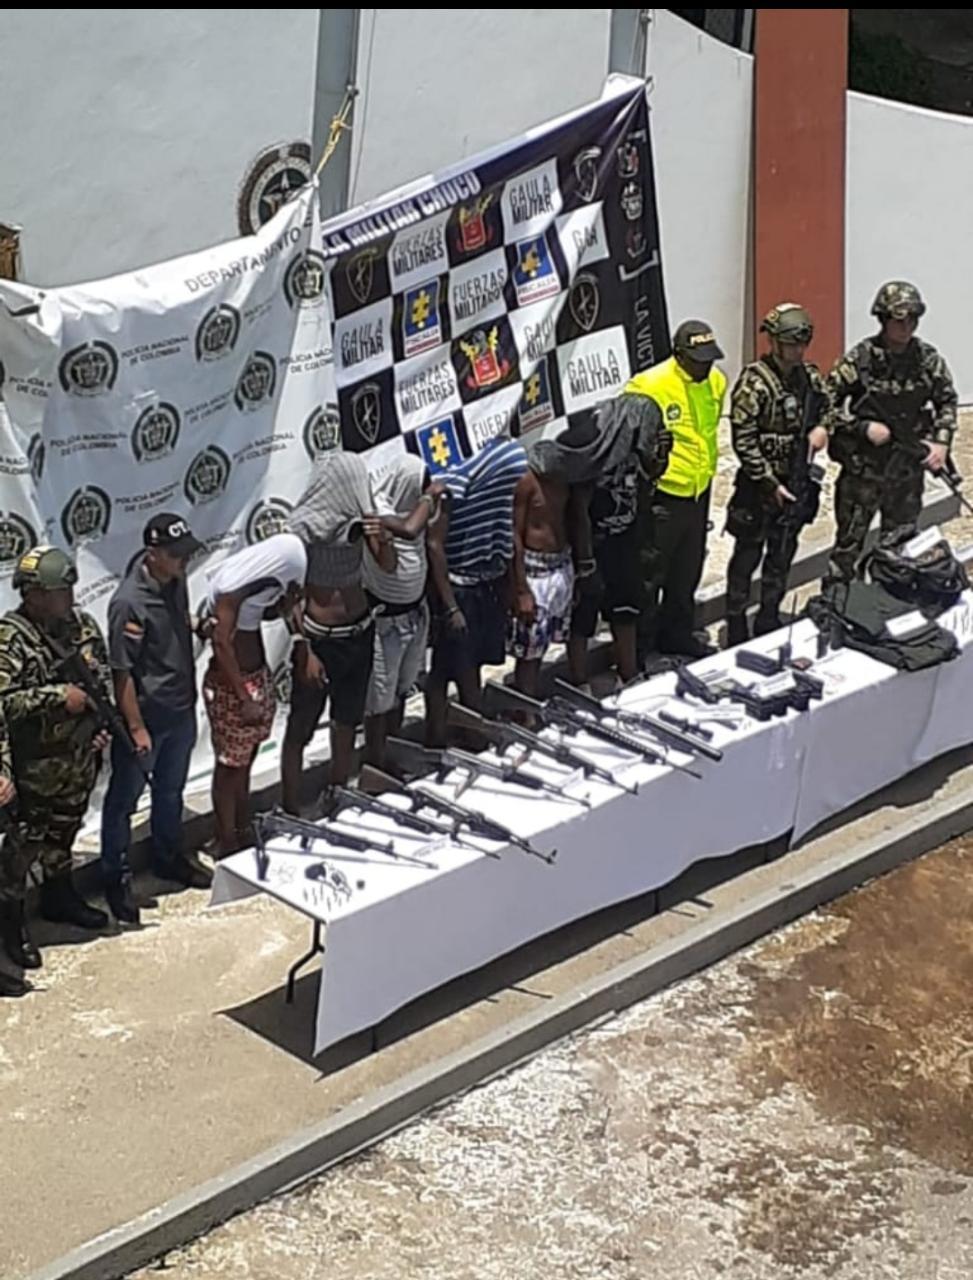 Capturan 6 sujetos e incautan abundante material de guerra en el Chocó